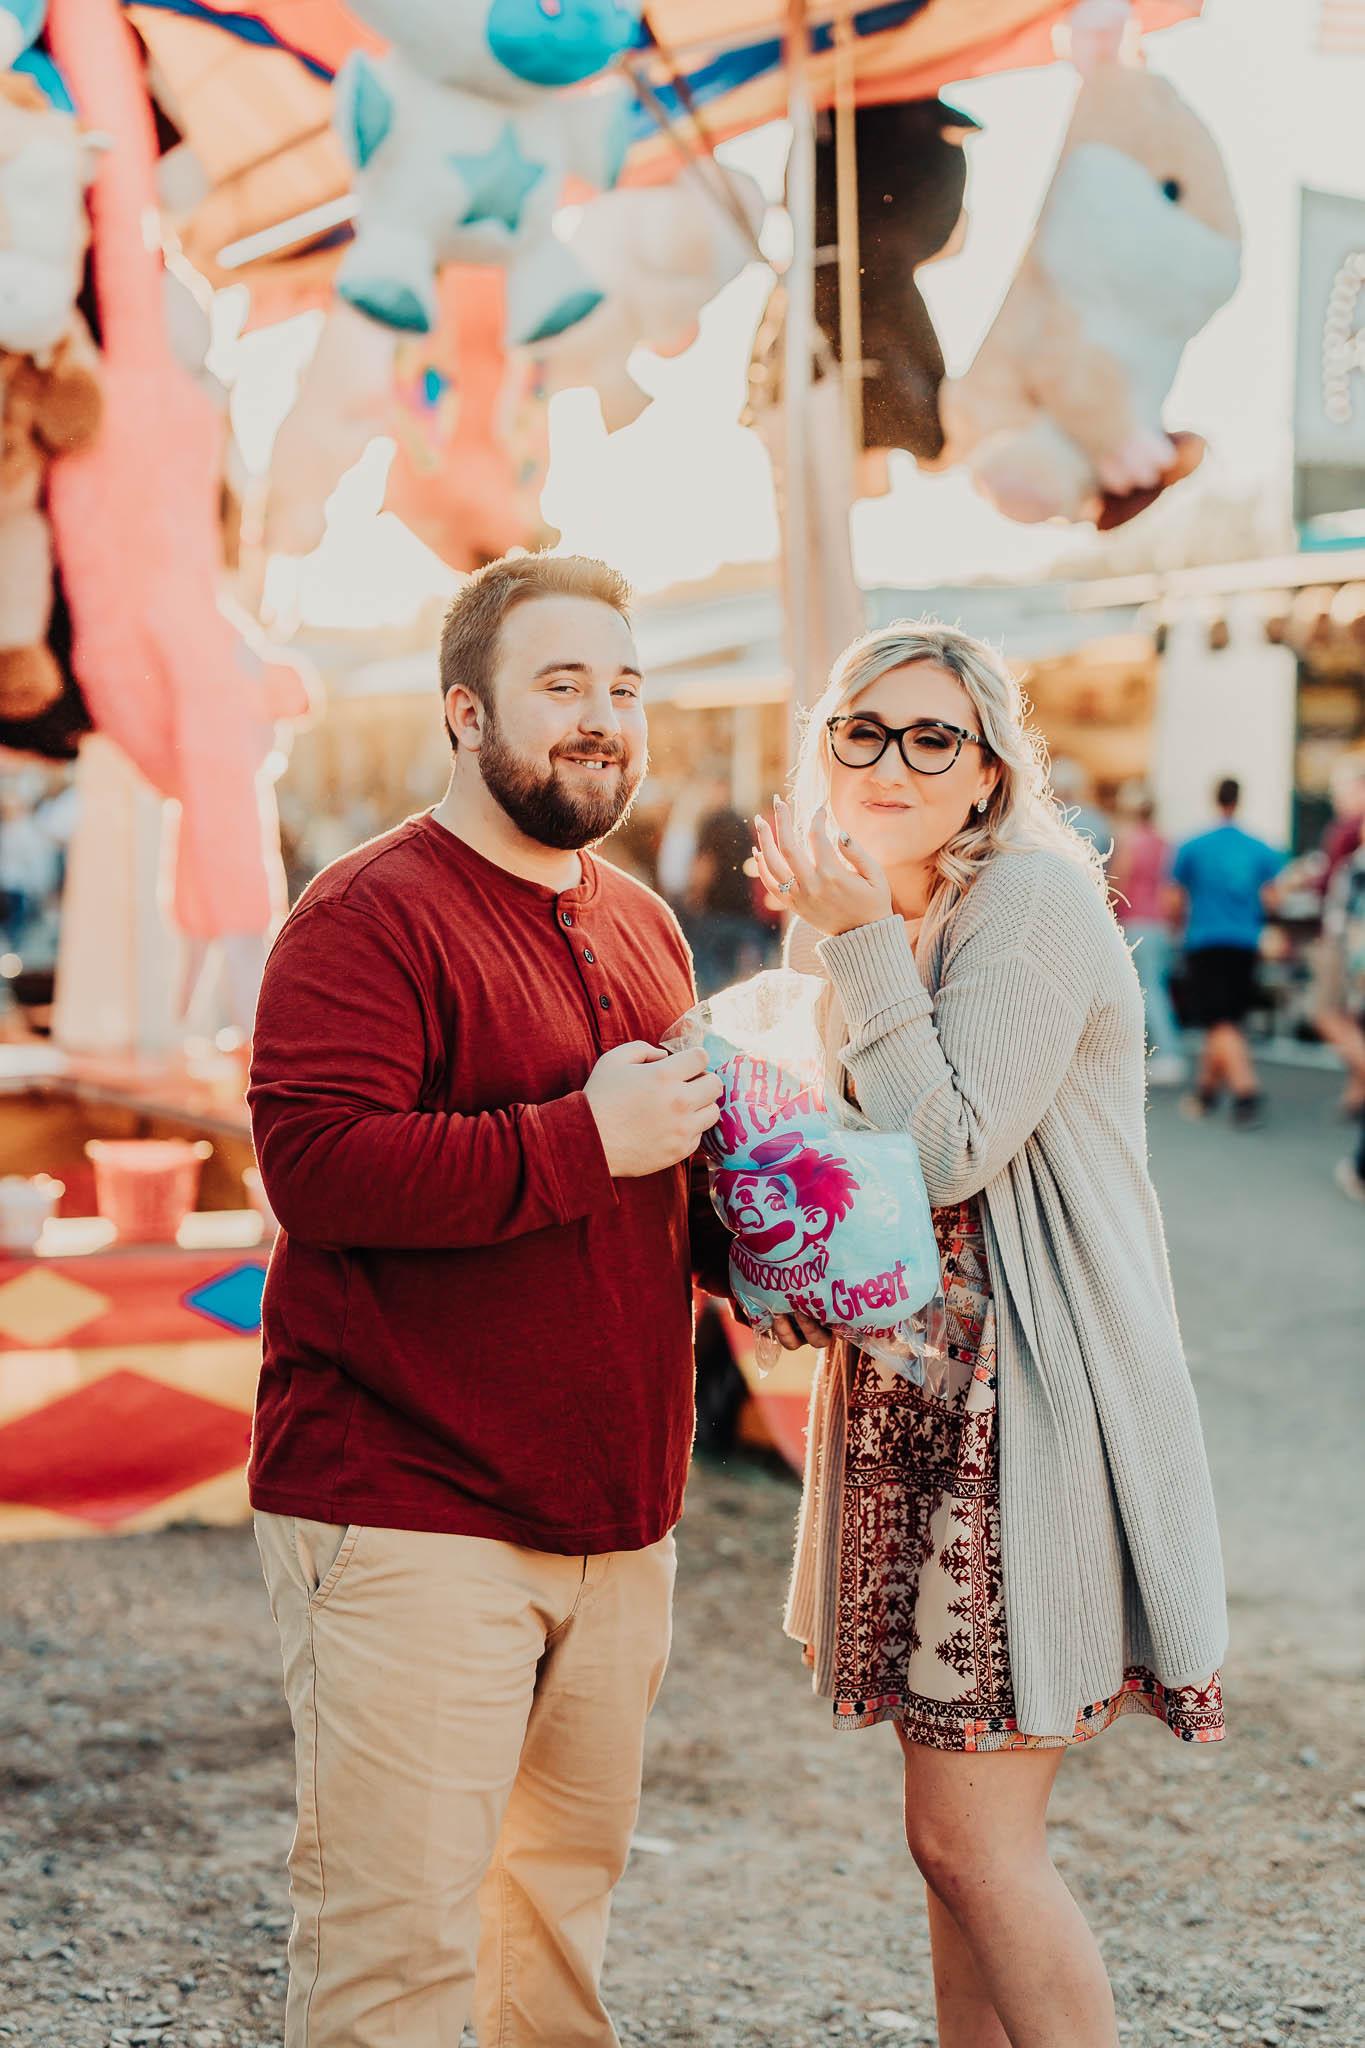 bloomsburg-fair-engagement-5335.jpg